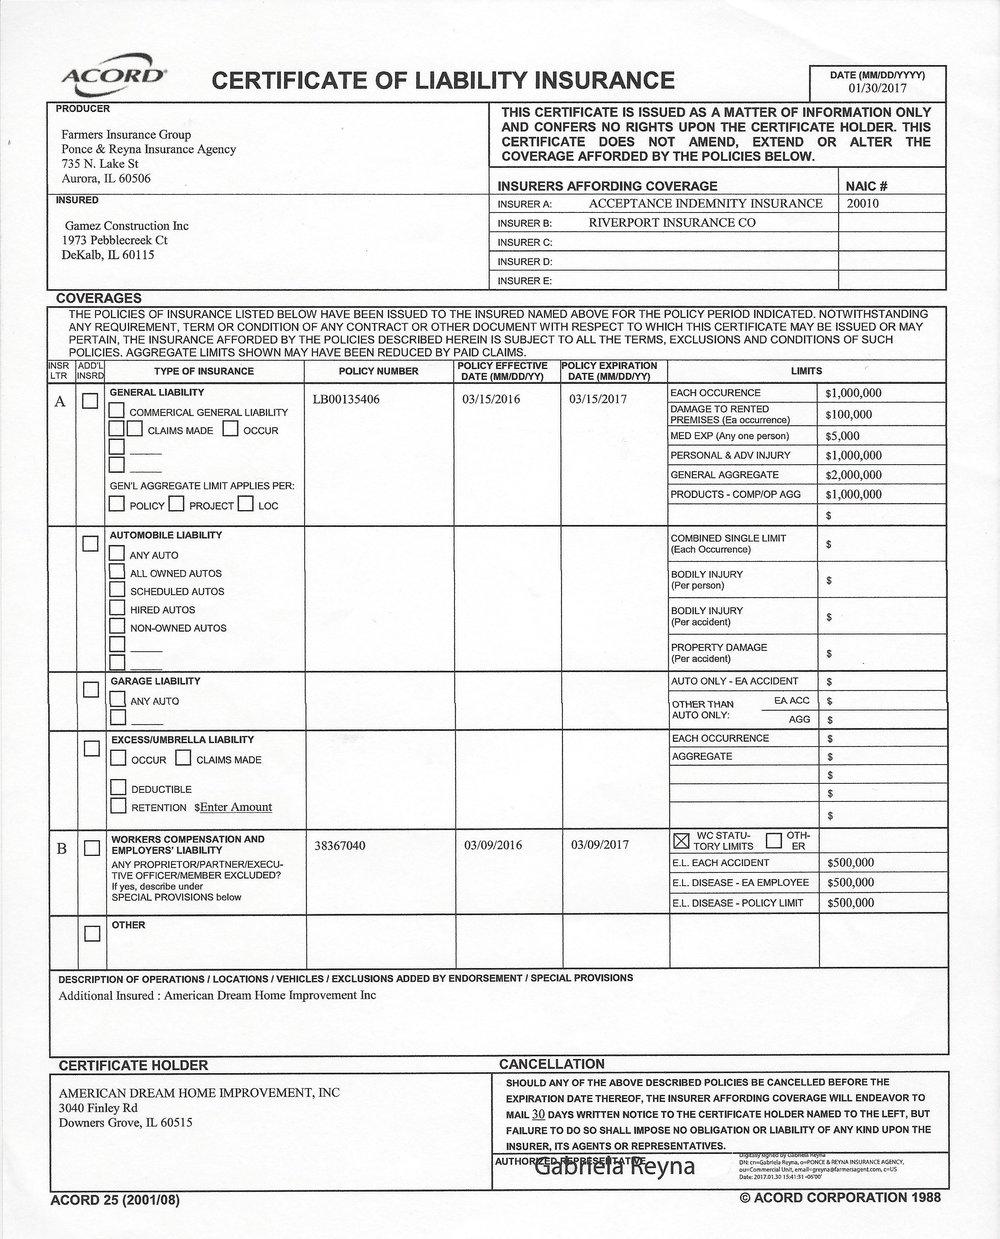 Insurance certifications gc gamez construction insurance certificateg 1betcityfo Images